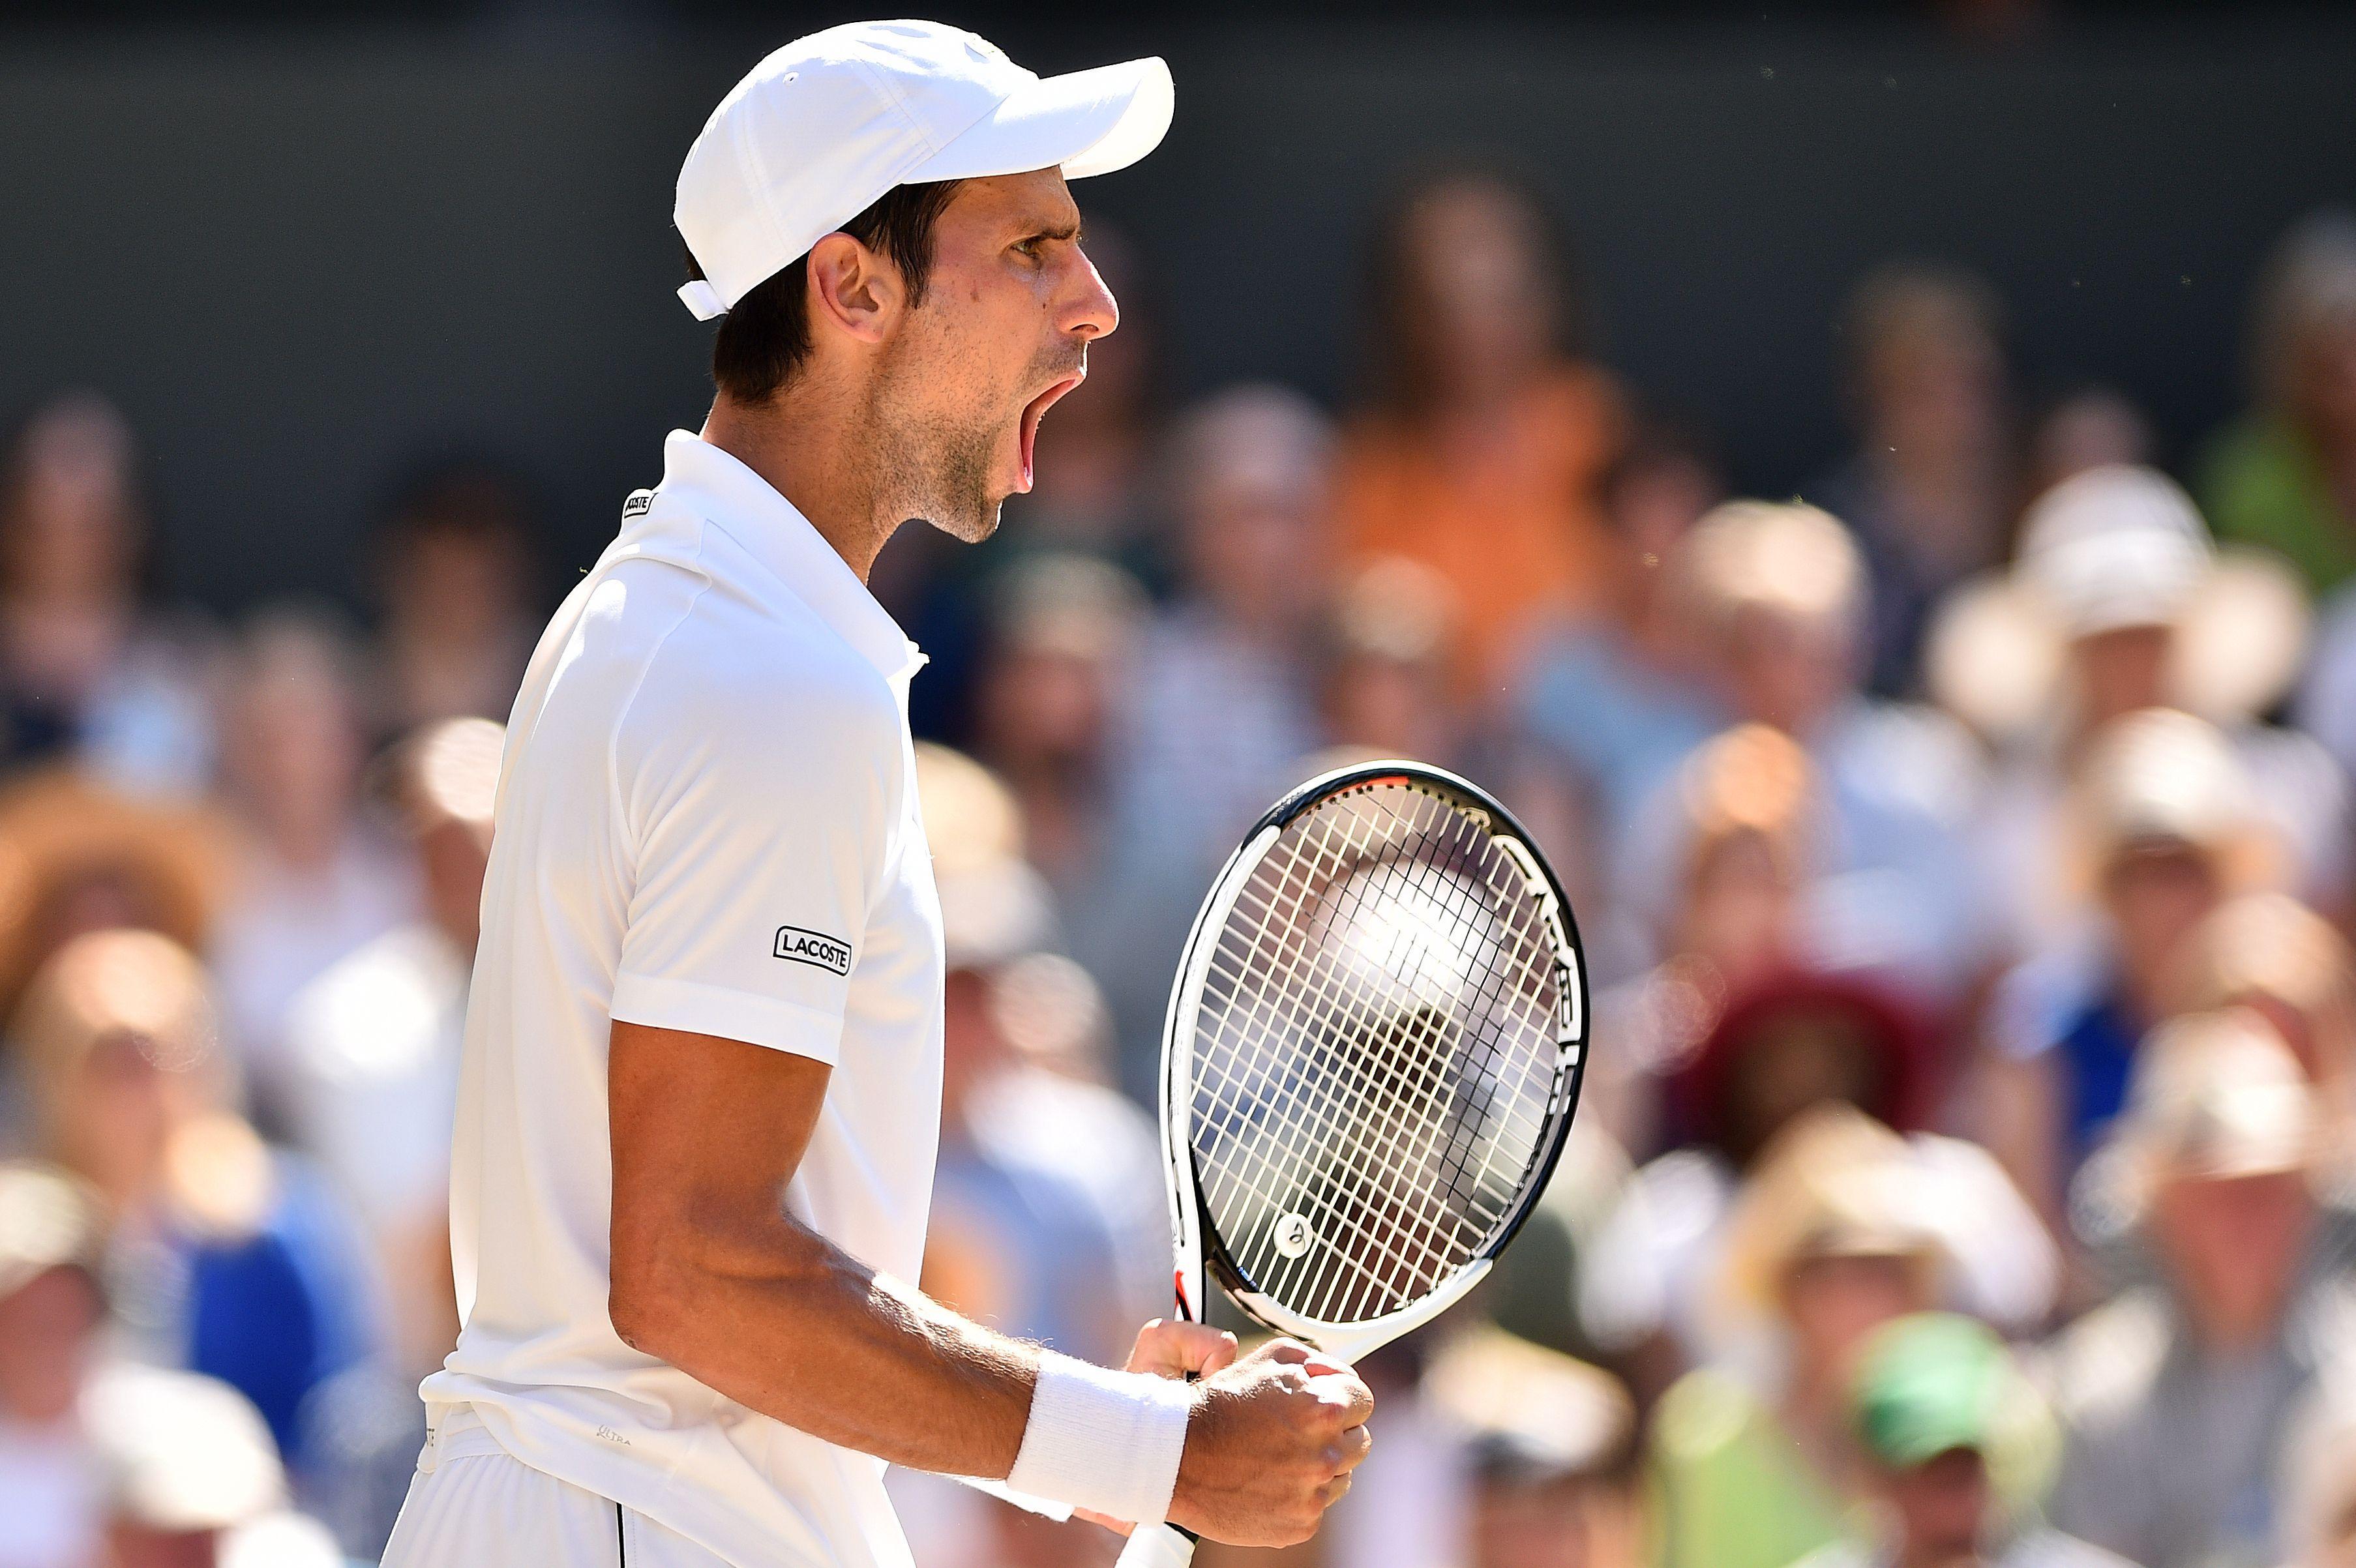 Wimbledon Novak Djokovic Wins Fourth Championship Beating Kevin Anderson Cbs News